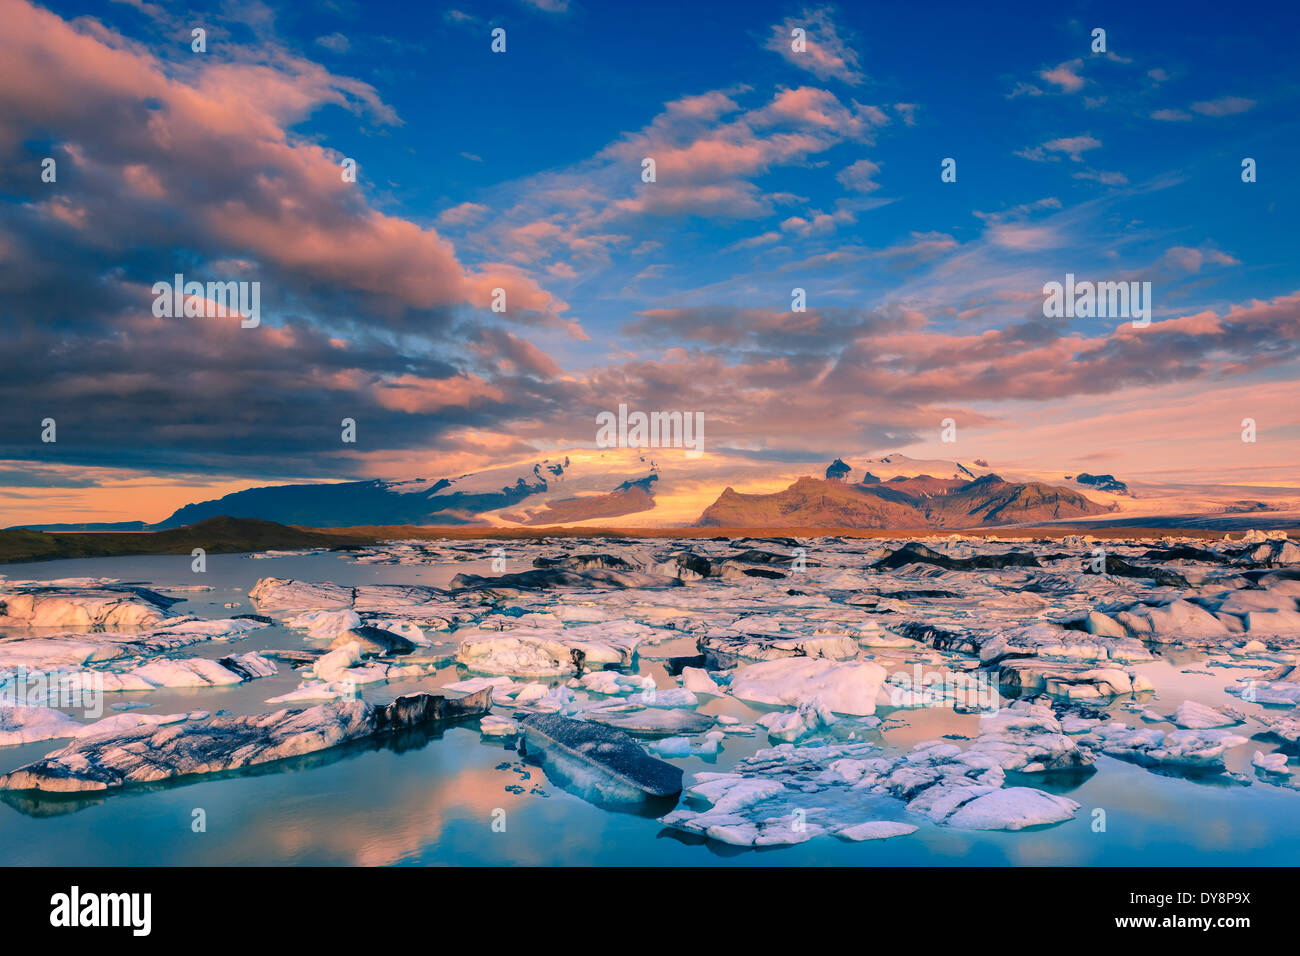 Sonnenaufgang am Jökulsárlón Gletschersee, Südküste, Island Stockbild